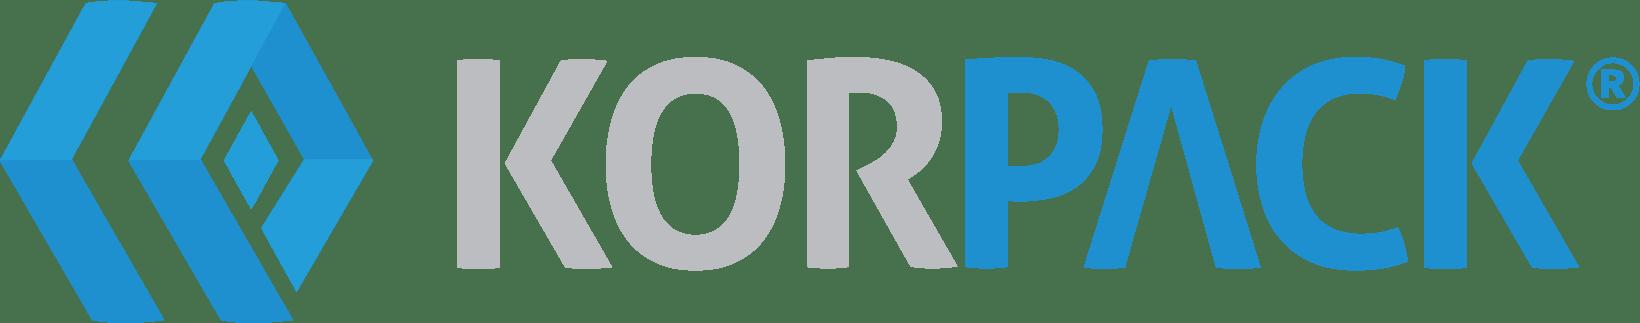 korpack-logo